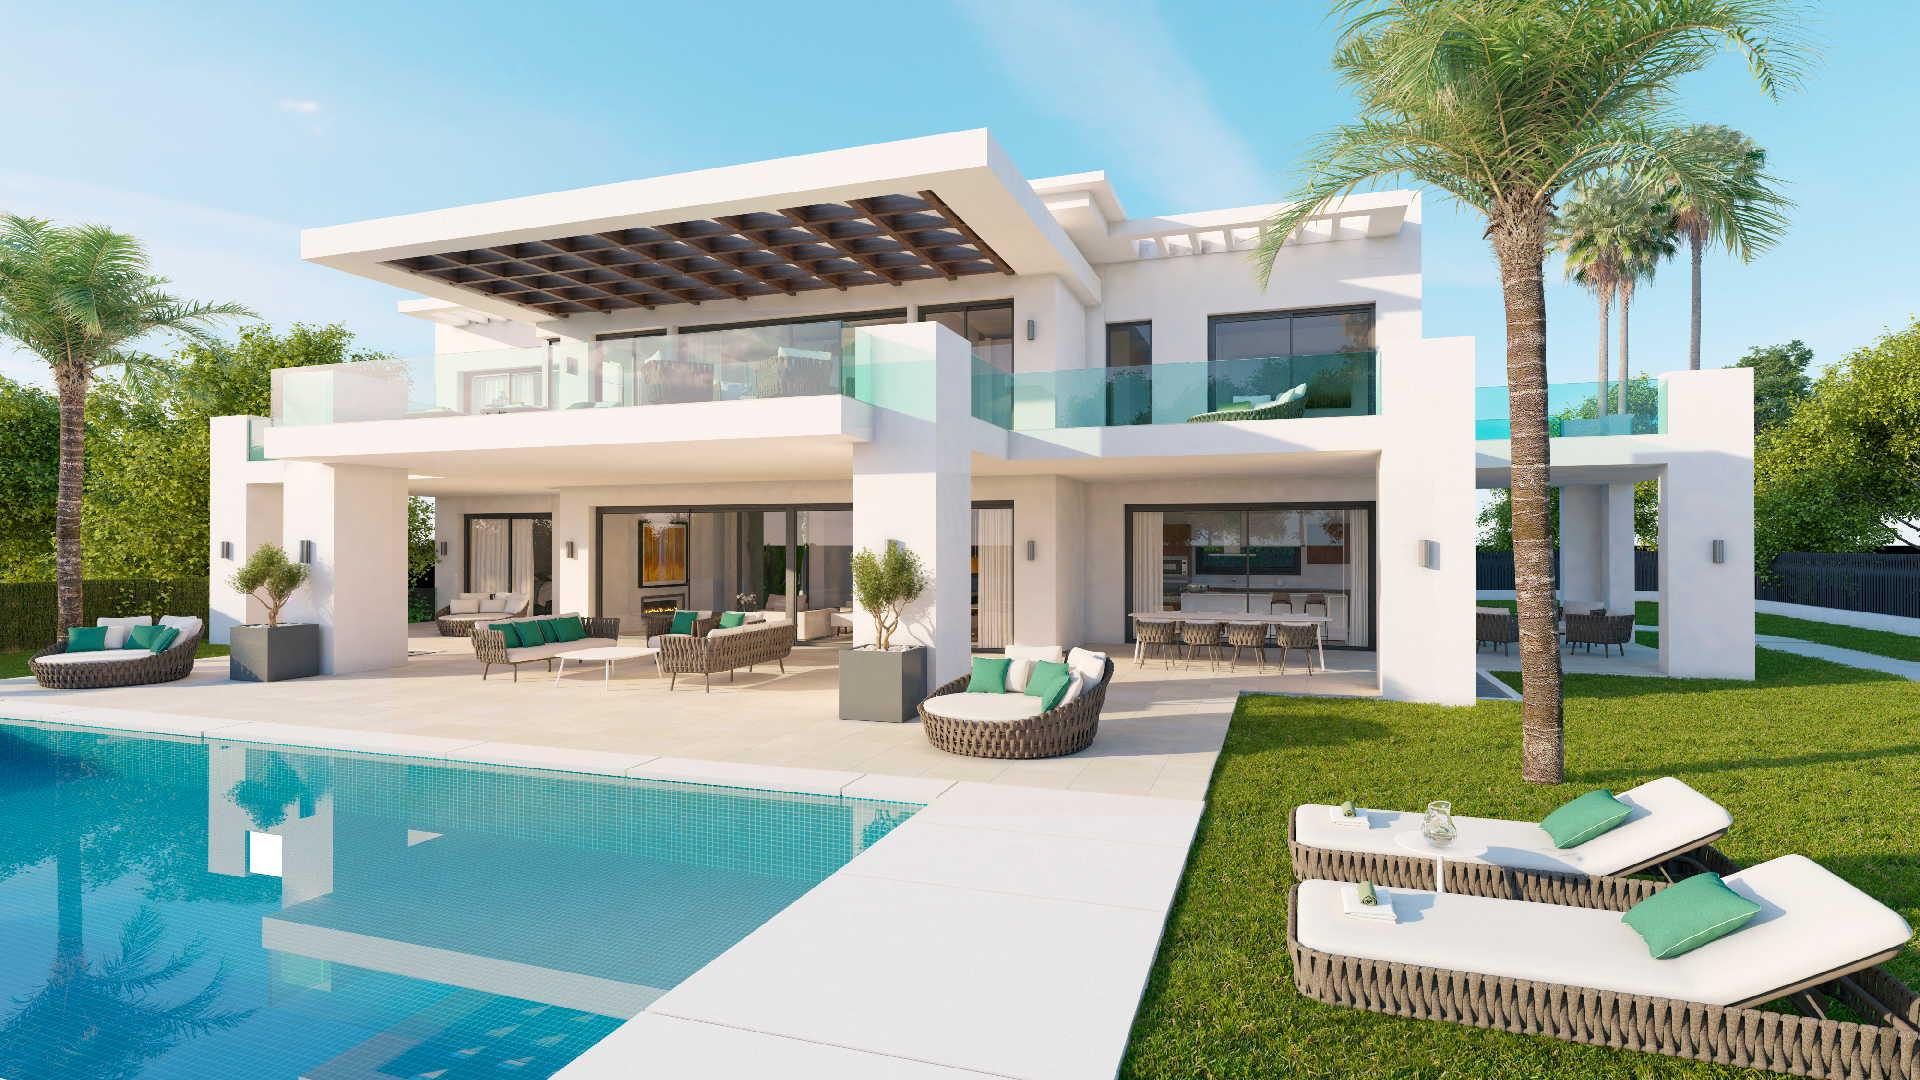 Los olivos nueva andalucia marbella new modern villa for Mar villa modelo